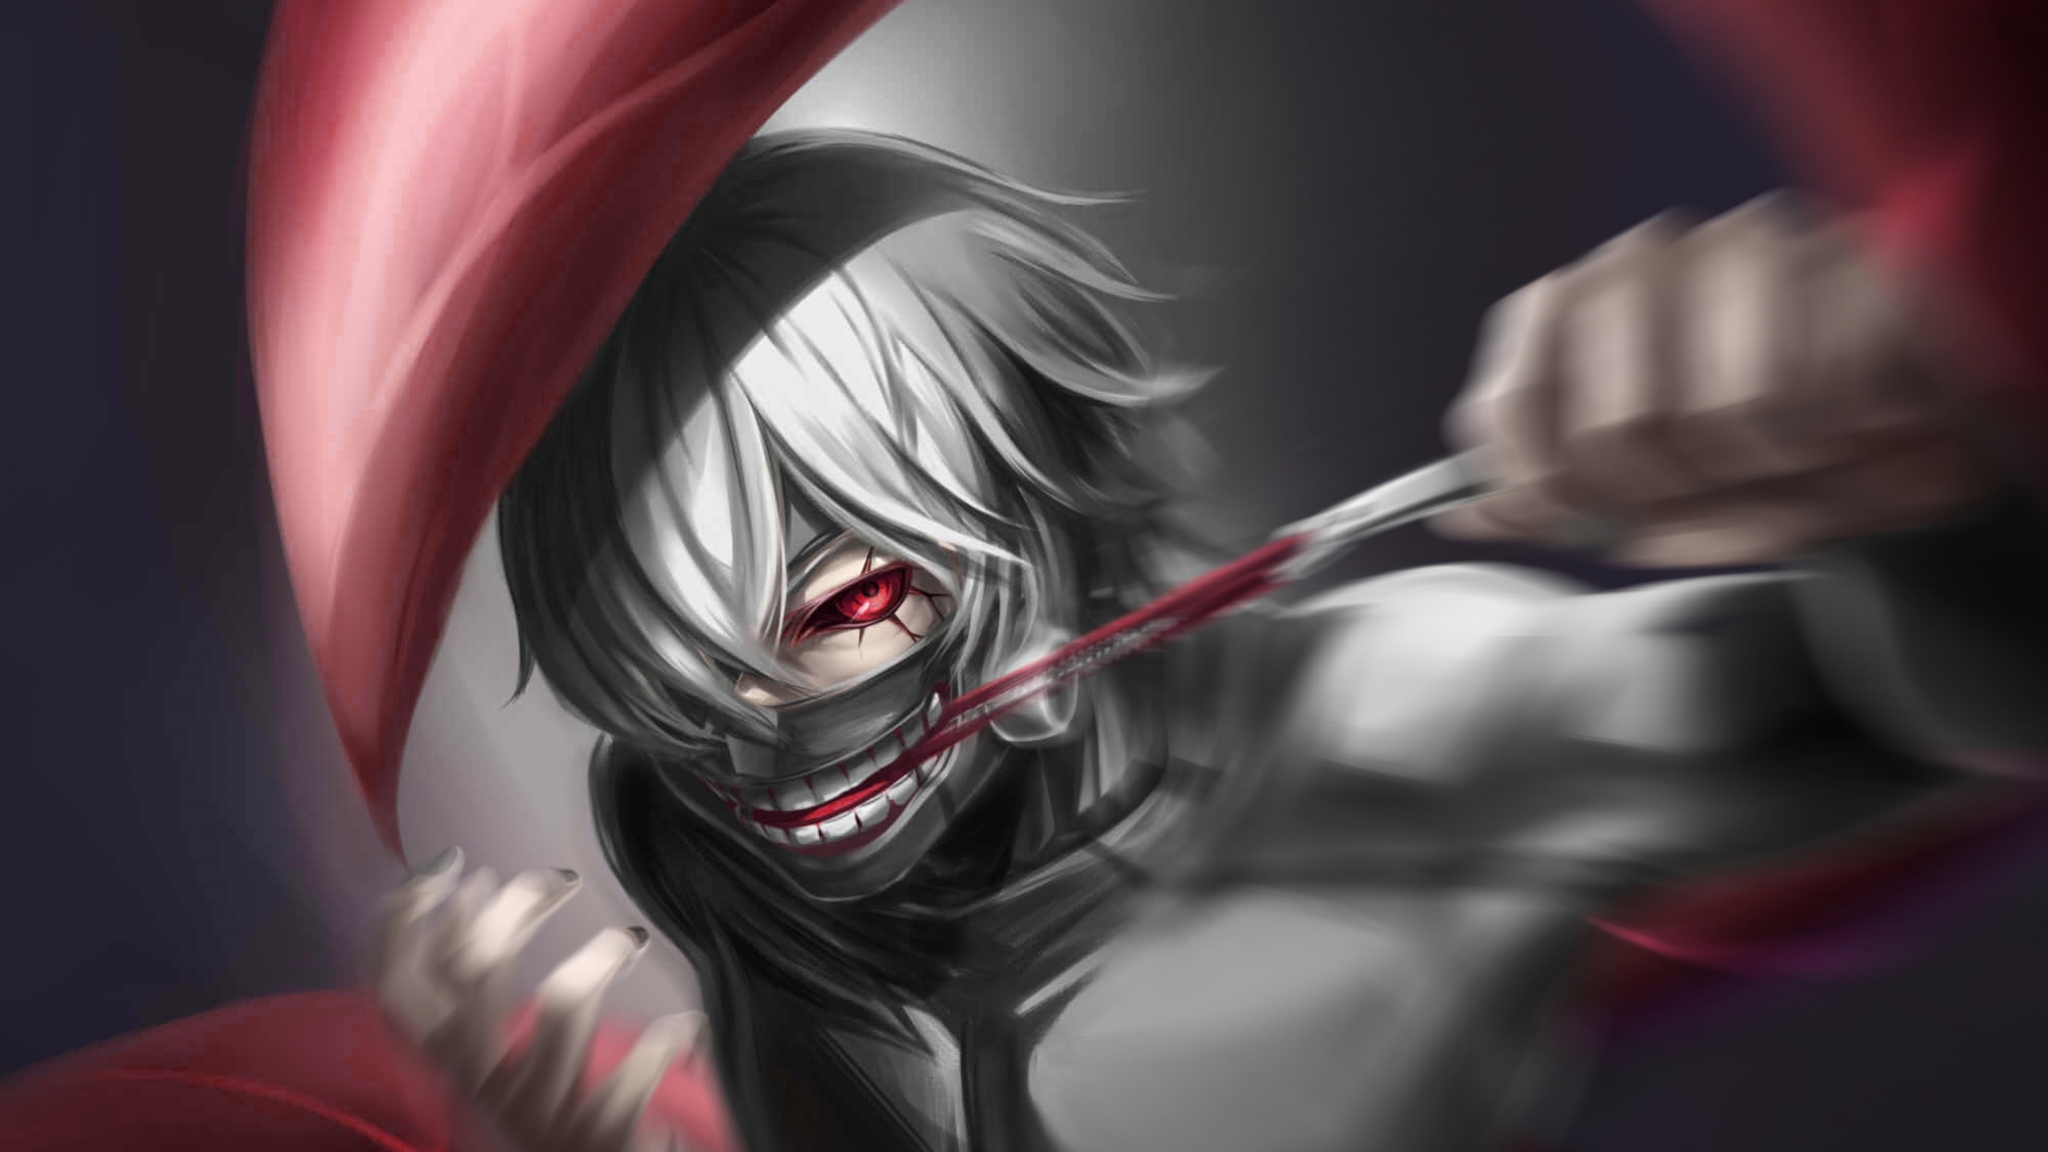 2048x1152 Tokyo Ghoul Kaneki Ken 4k 2048x1152 Resolution Hd 4k